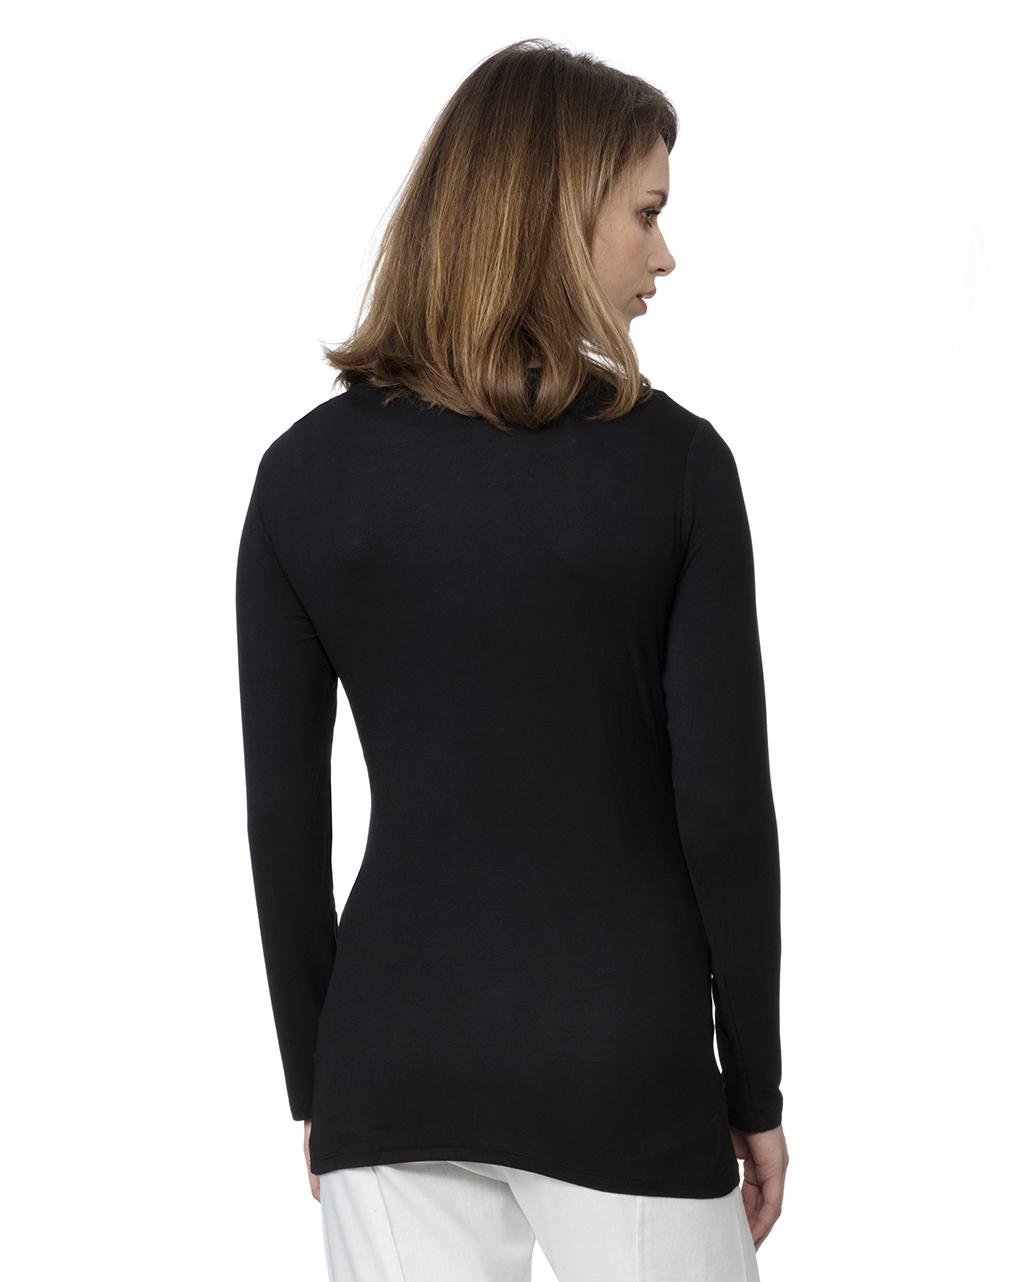 T-shirt nera per allattamento maniche lunghe - Prénatal